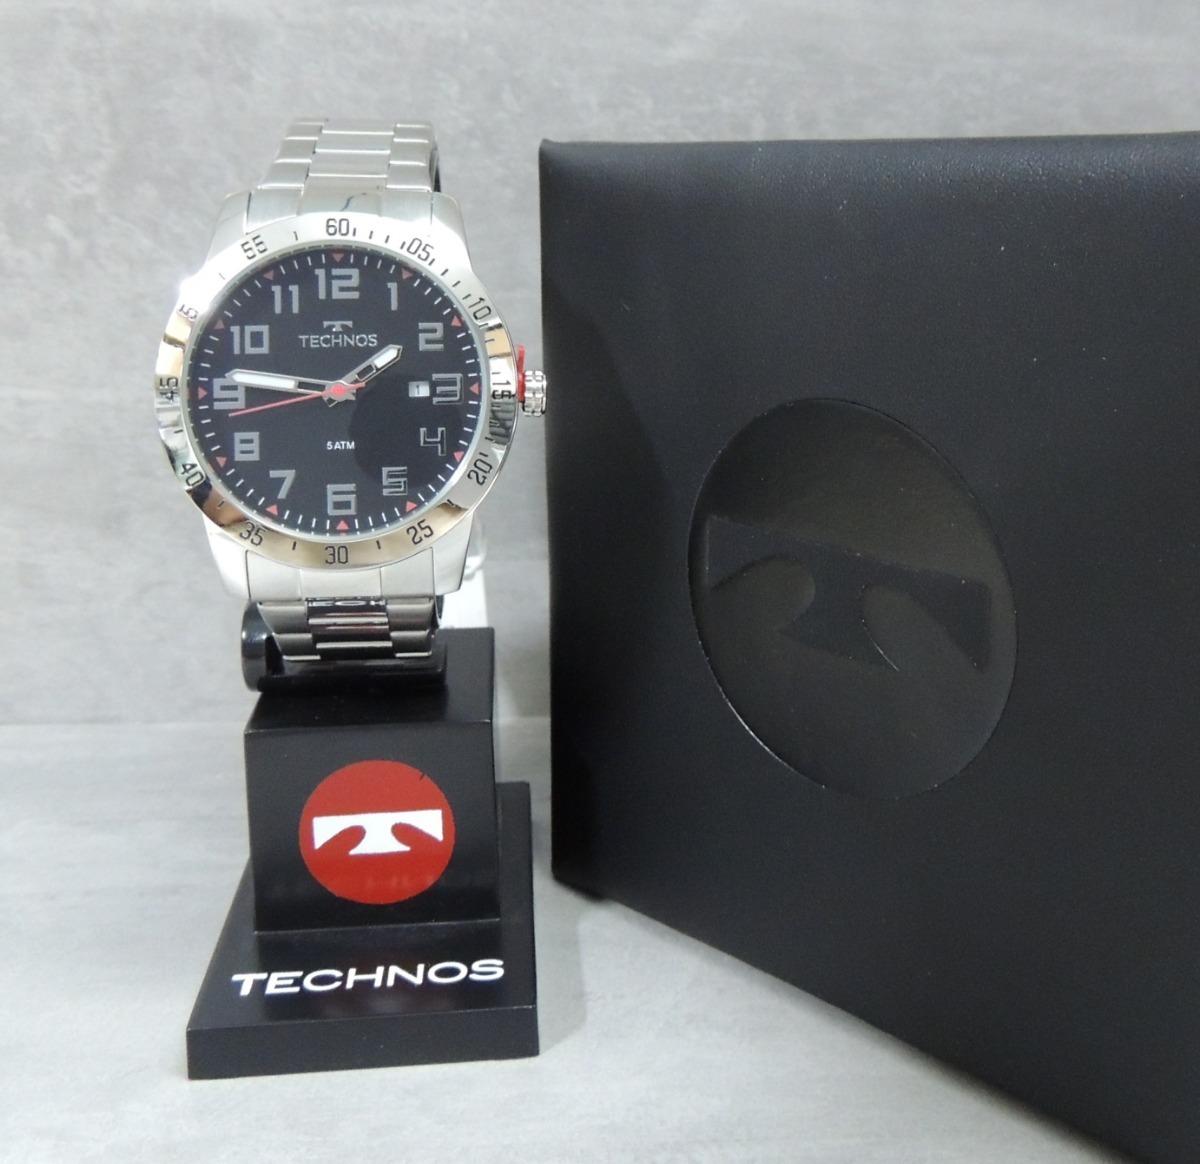 8d4d8f9818b78 relógio technos masculino 2115mli 1p performance military nf. Carregando  zoom.